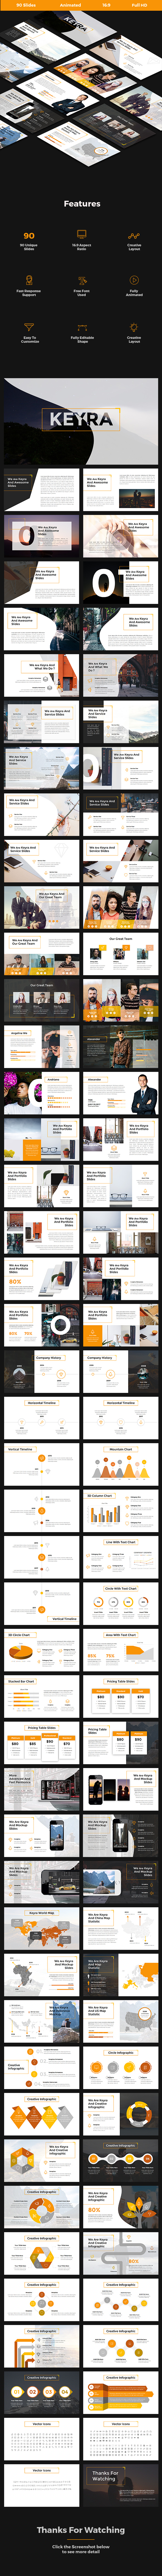 Keyra - Creative Powerpoint Template - Creative PowerPoint Templates